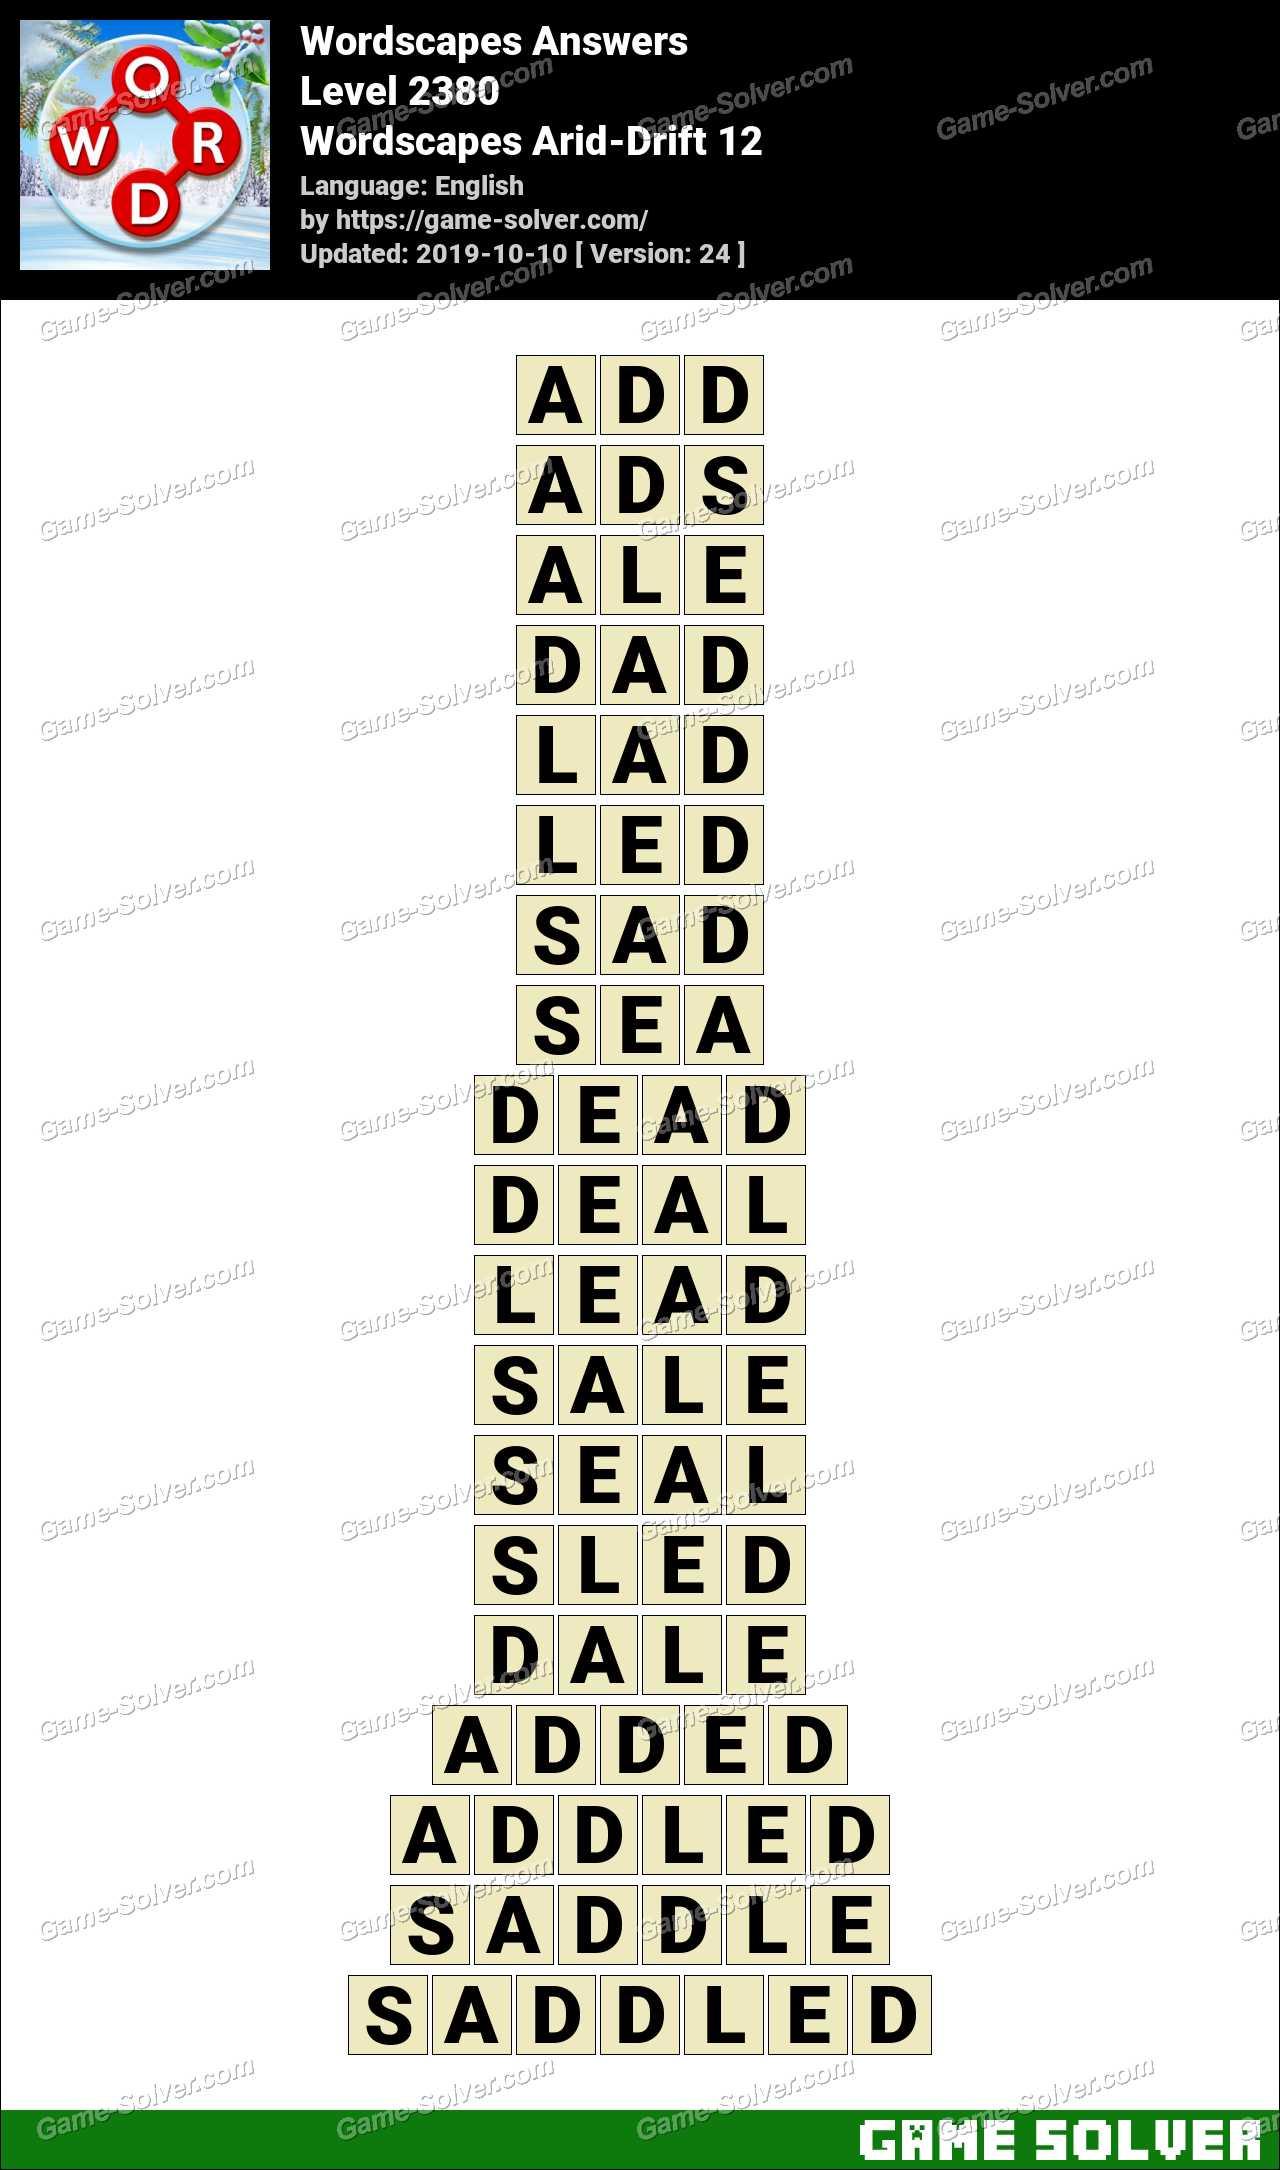 Wordscapes Arid-Drift 12 Answers